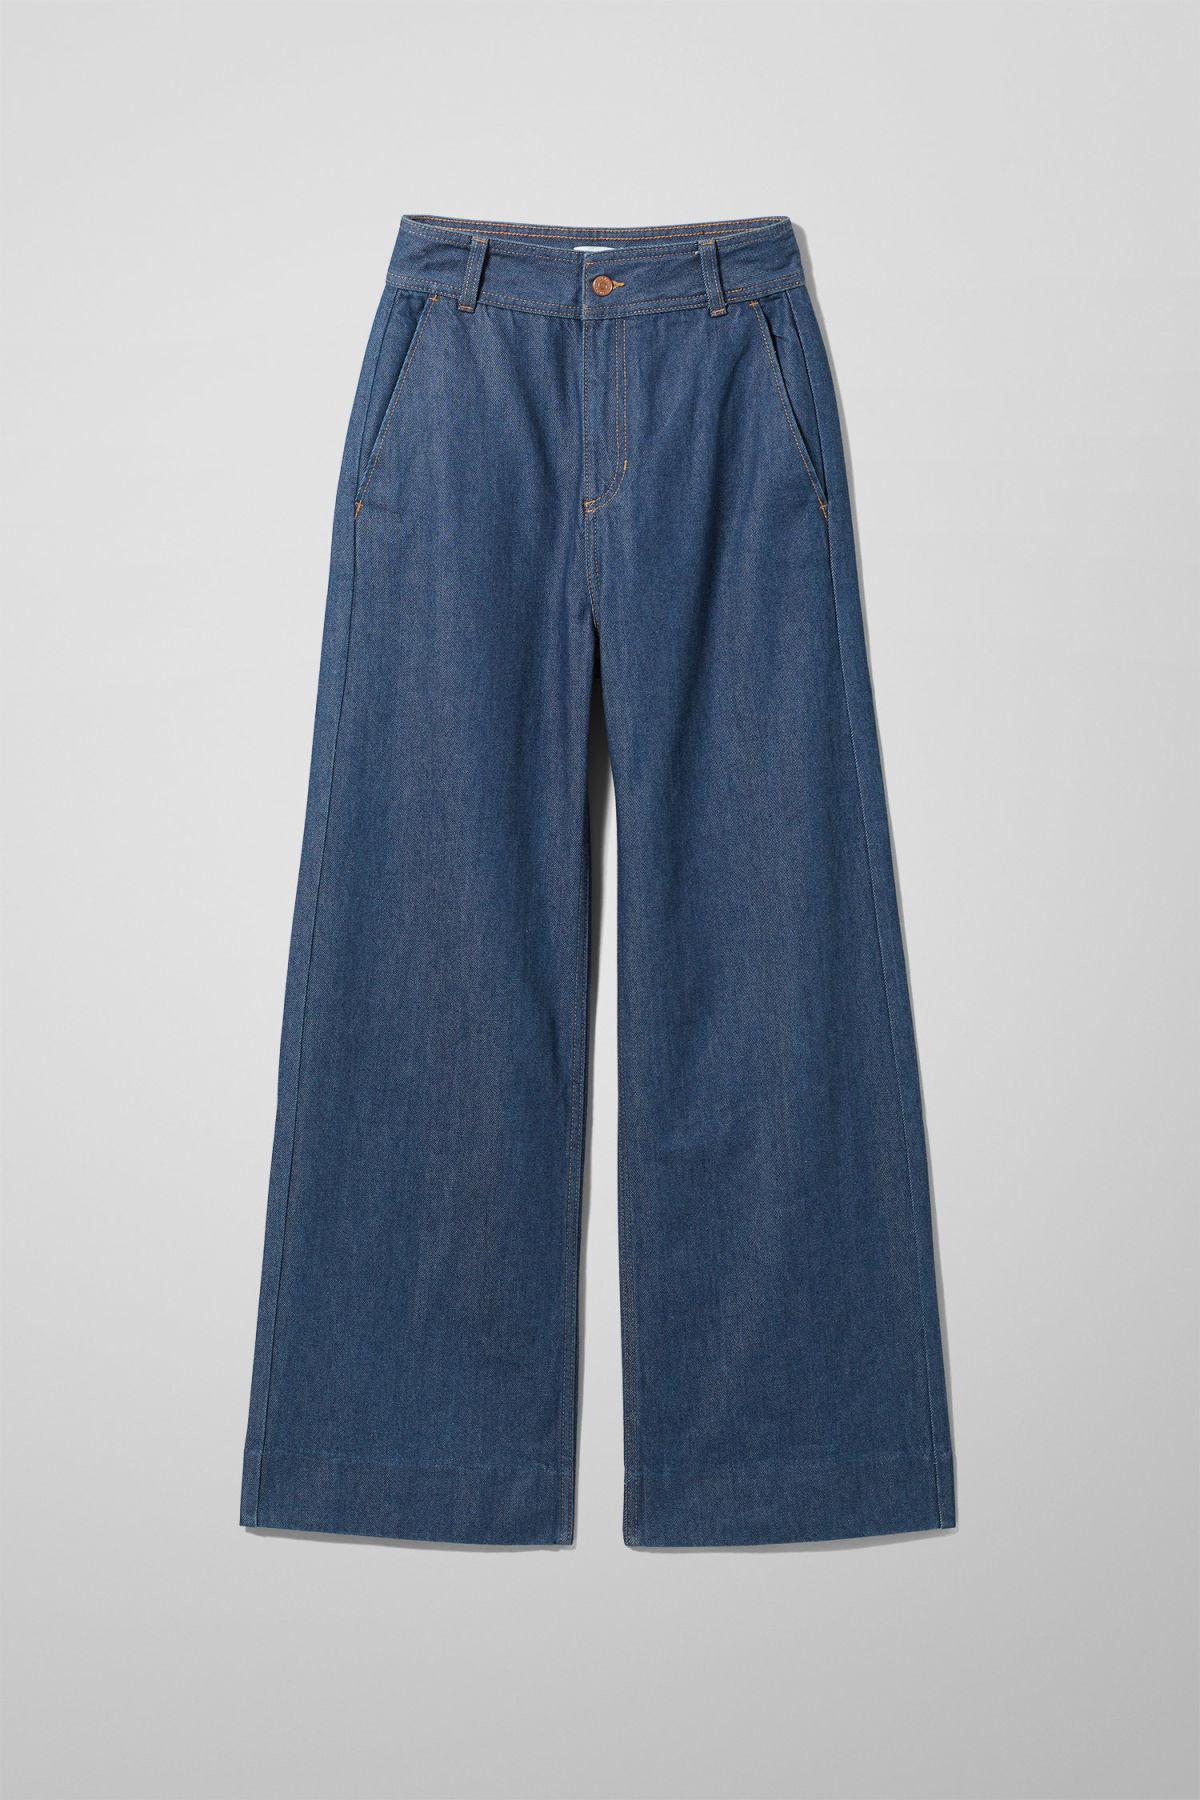 Cory Denim Trousers - Blue-40